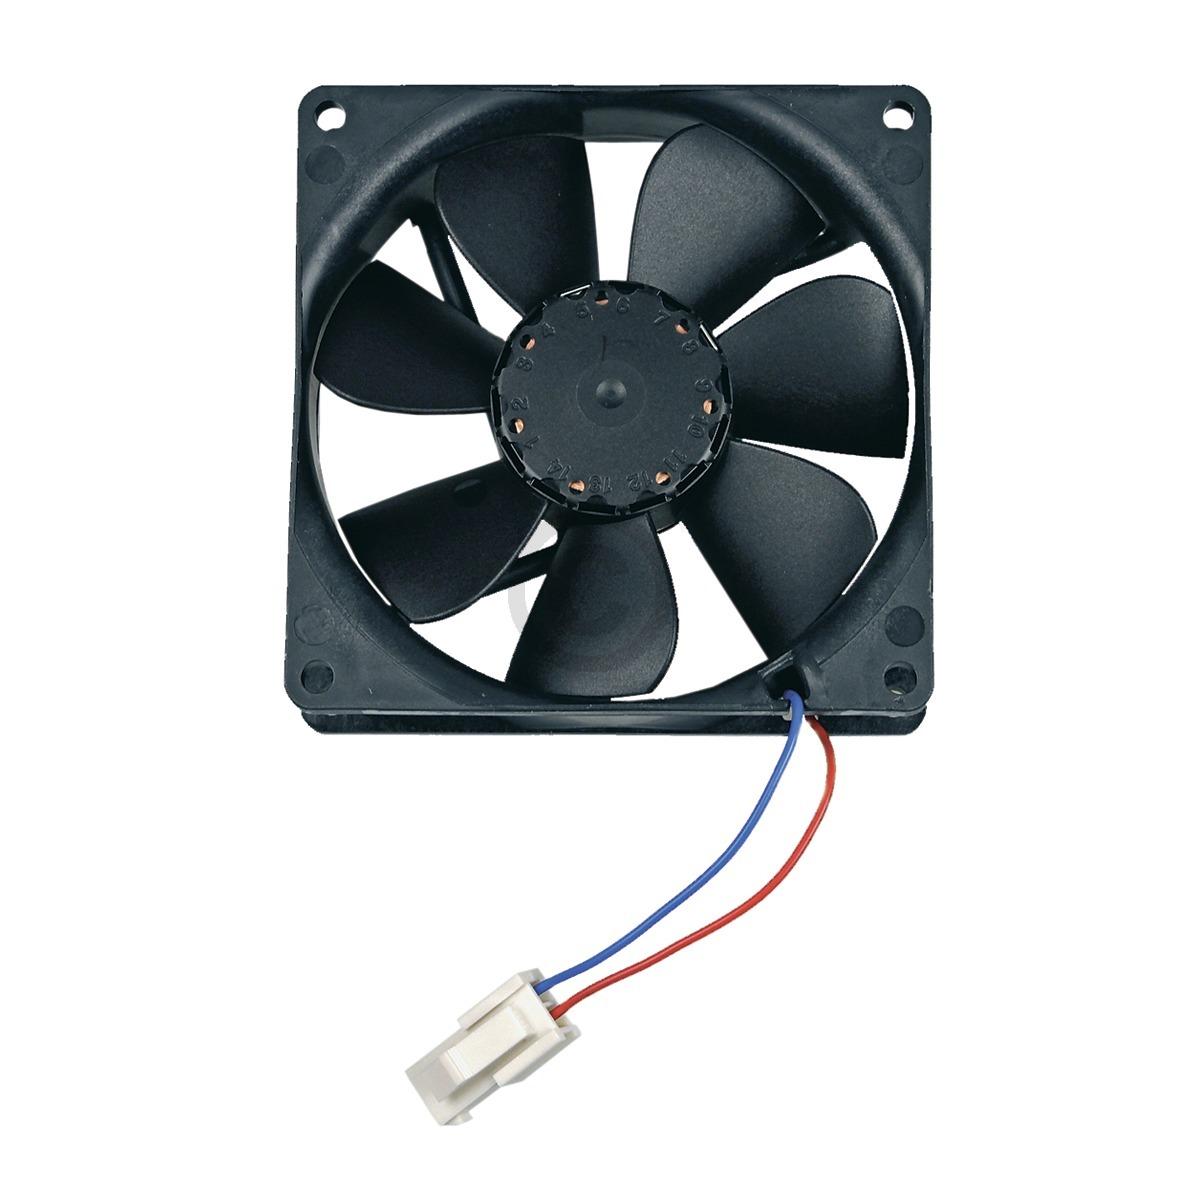 Ventilator 1,1 Watt, 12 Volt fürs Kühlabteil 6108098 Liebherr